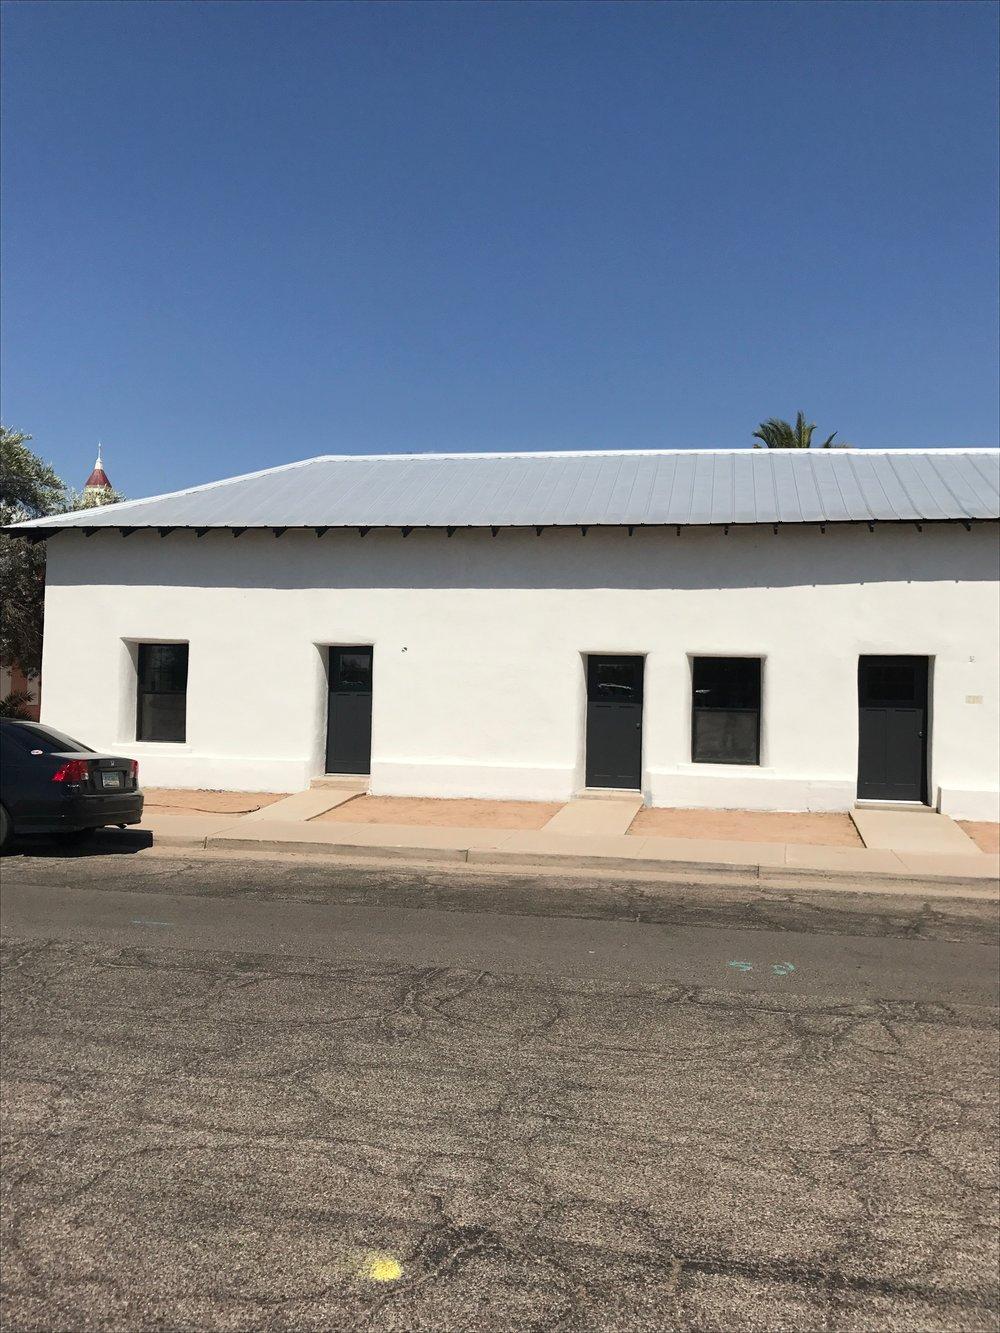 Rowhouse25 - Tremaine Ranch - Air BNB Rental - Phoenix, Arizona12.JPG